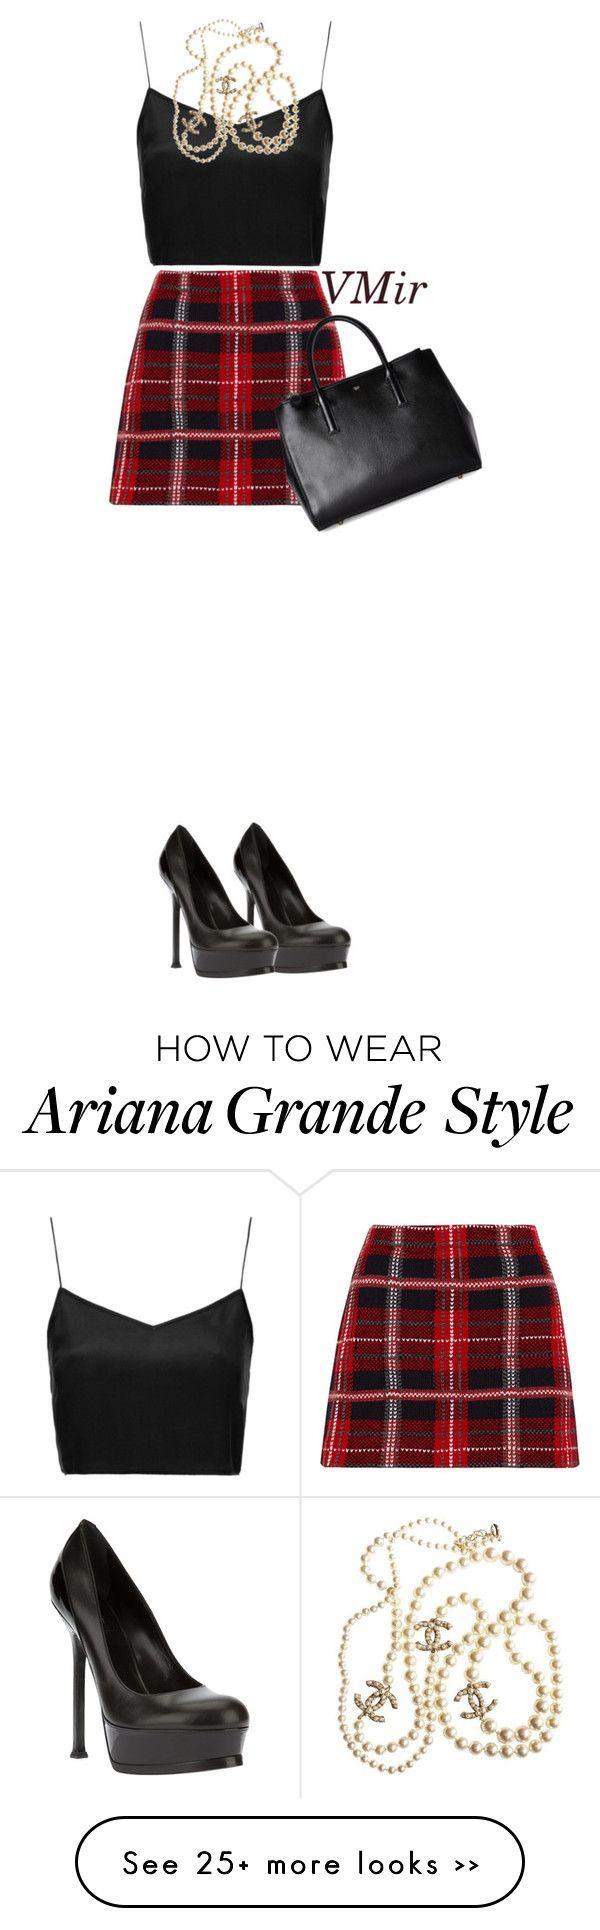 """Ariana Grande Style"" by vmirovski on Polyvore"